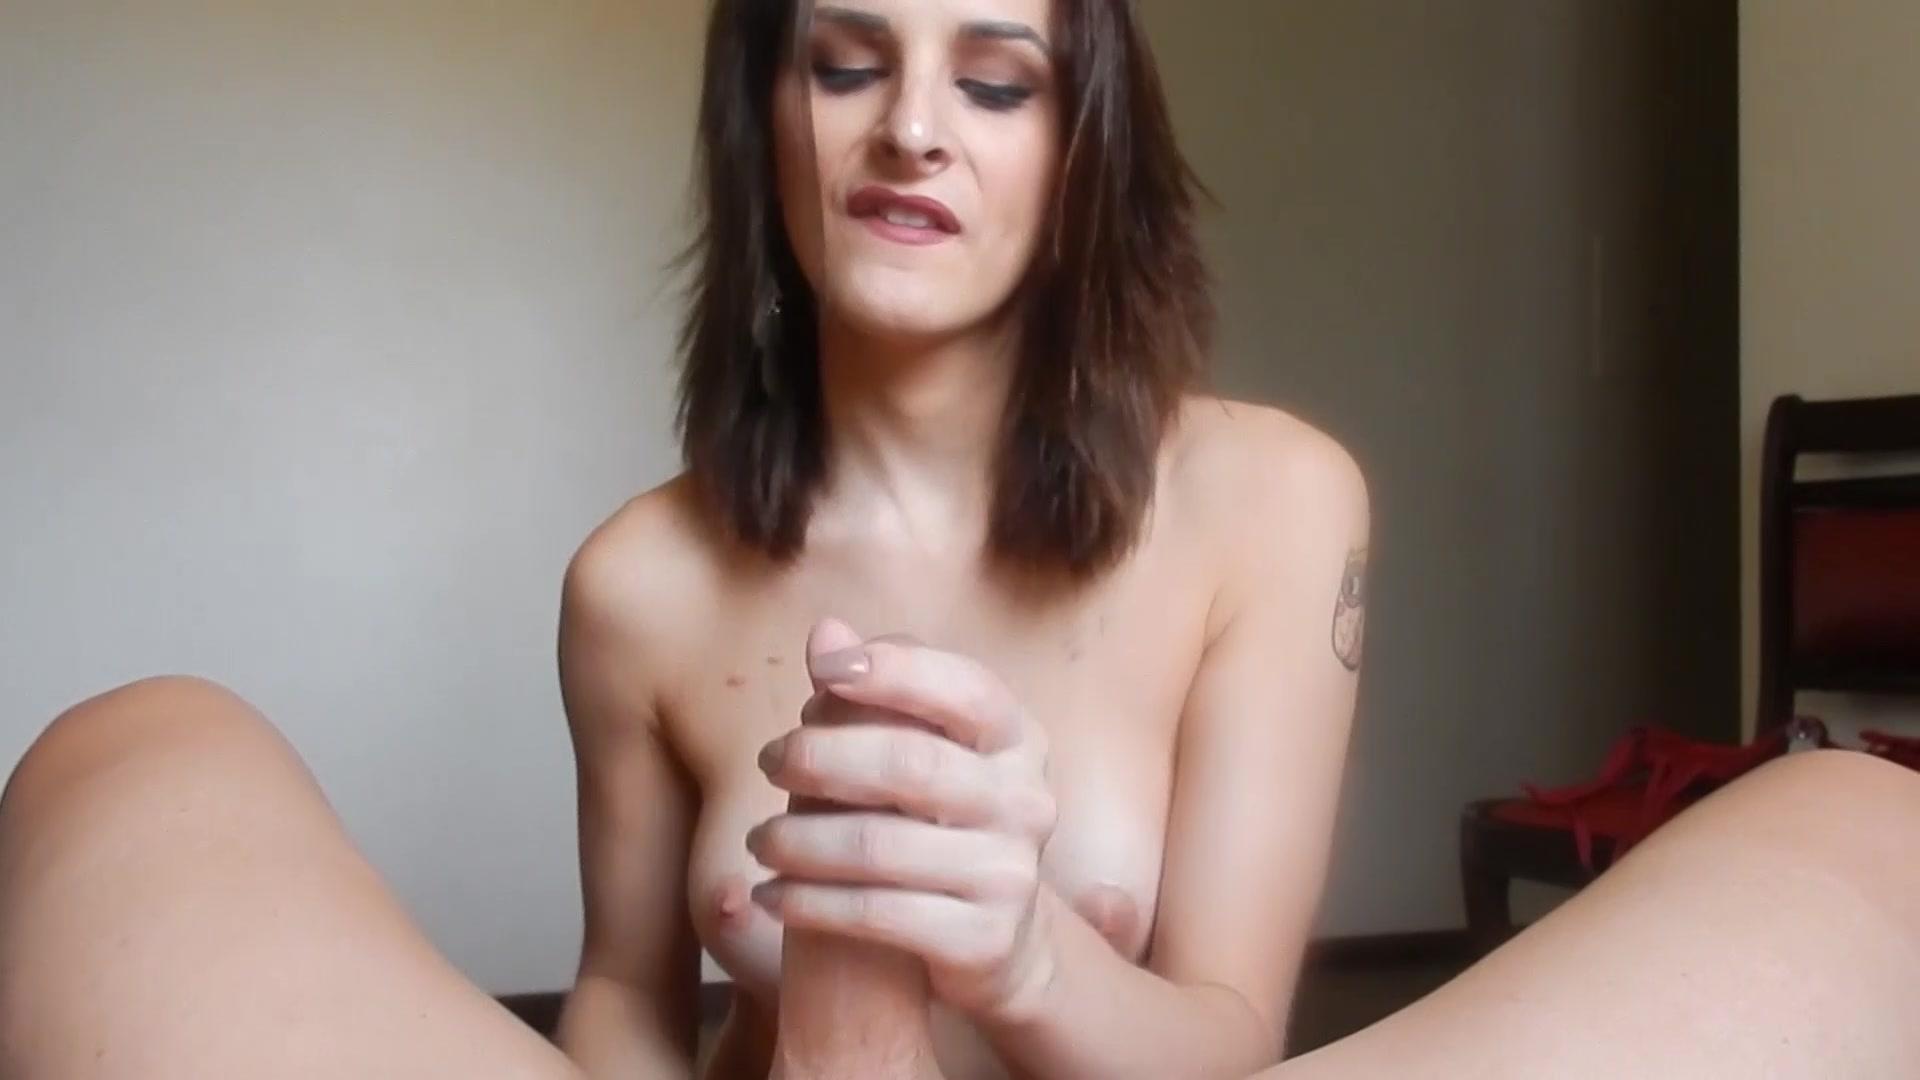 Shemale anal hentai